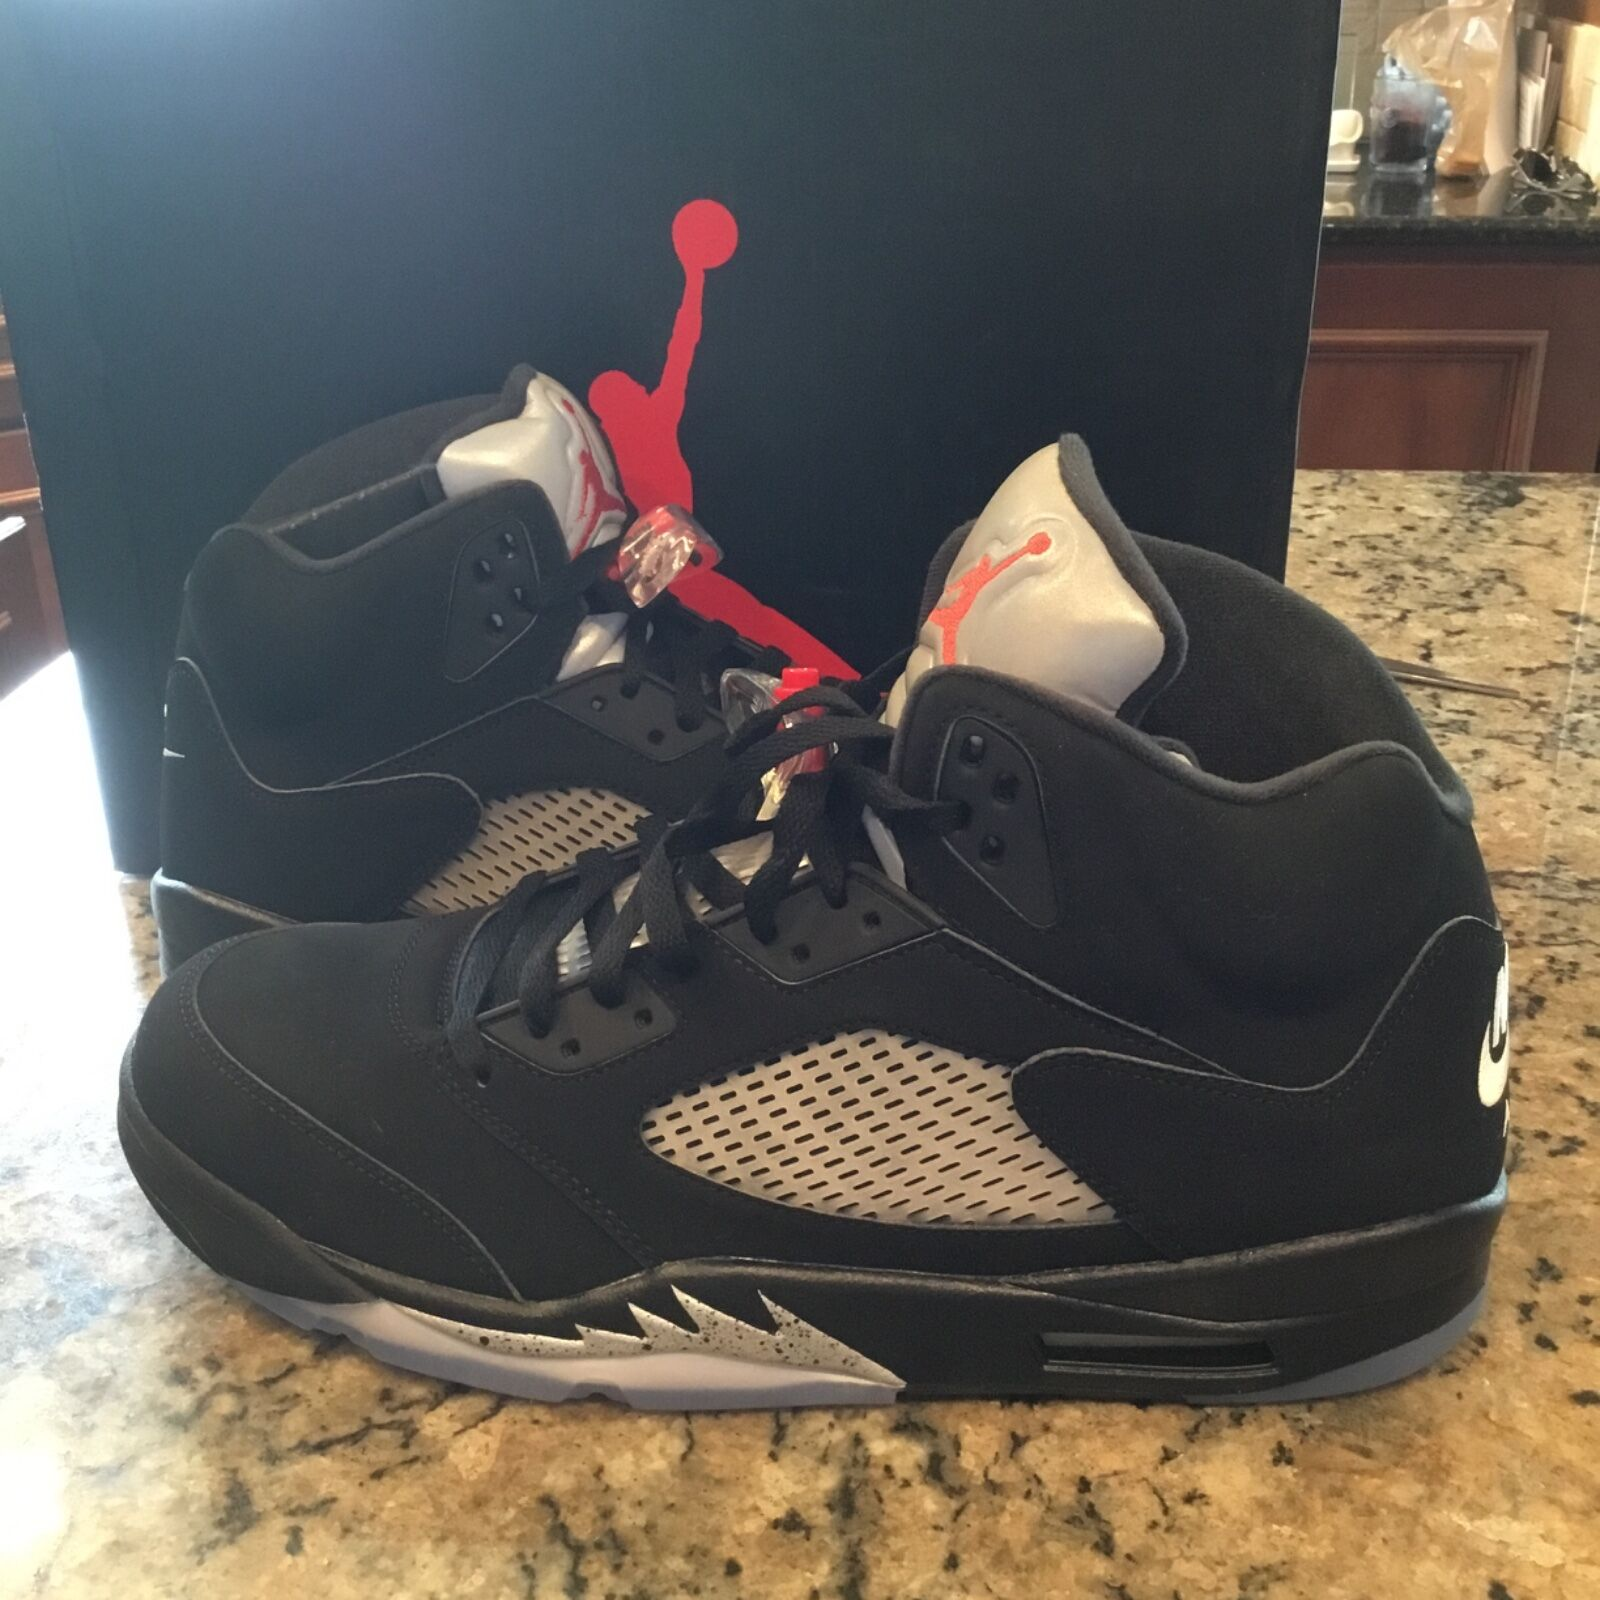 Nike Air Jordan 5 Retro OG Black and Metallic  845035 003 size 14 US